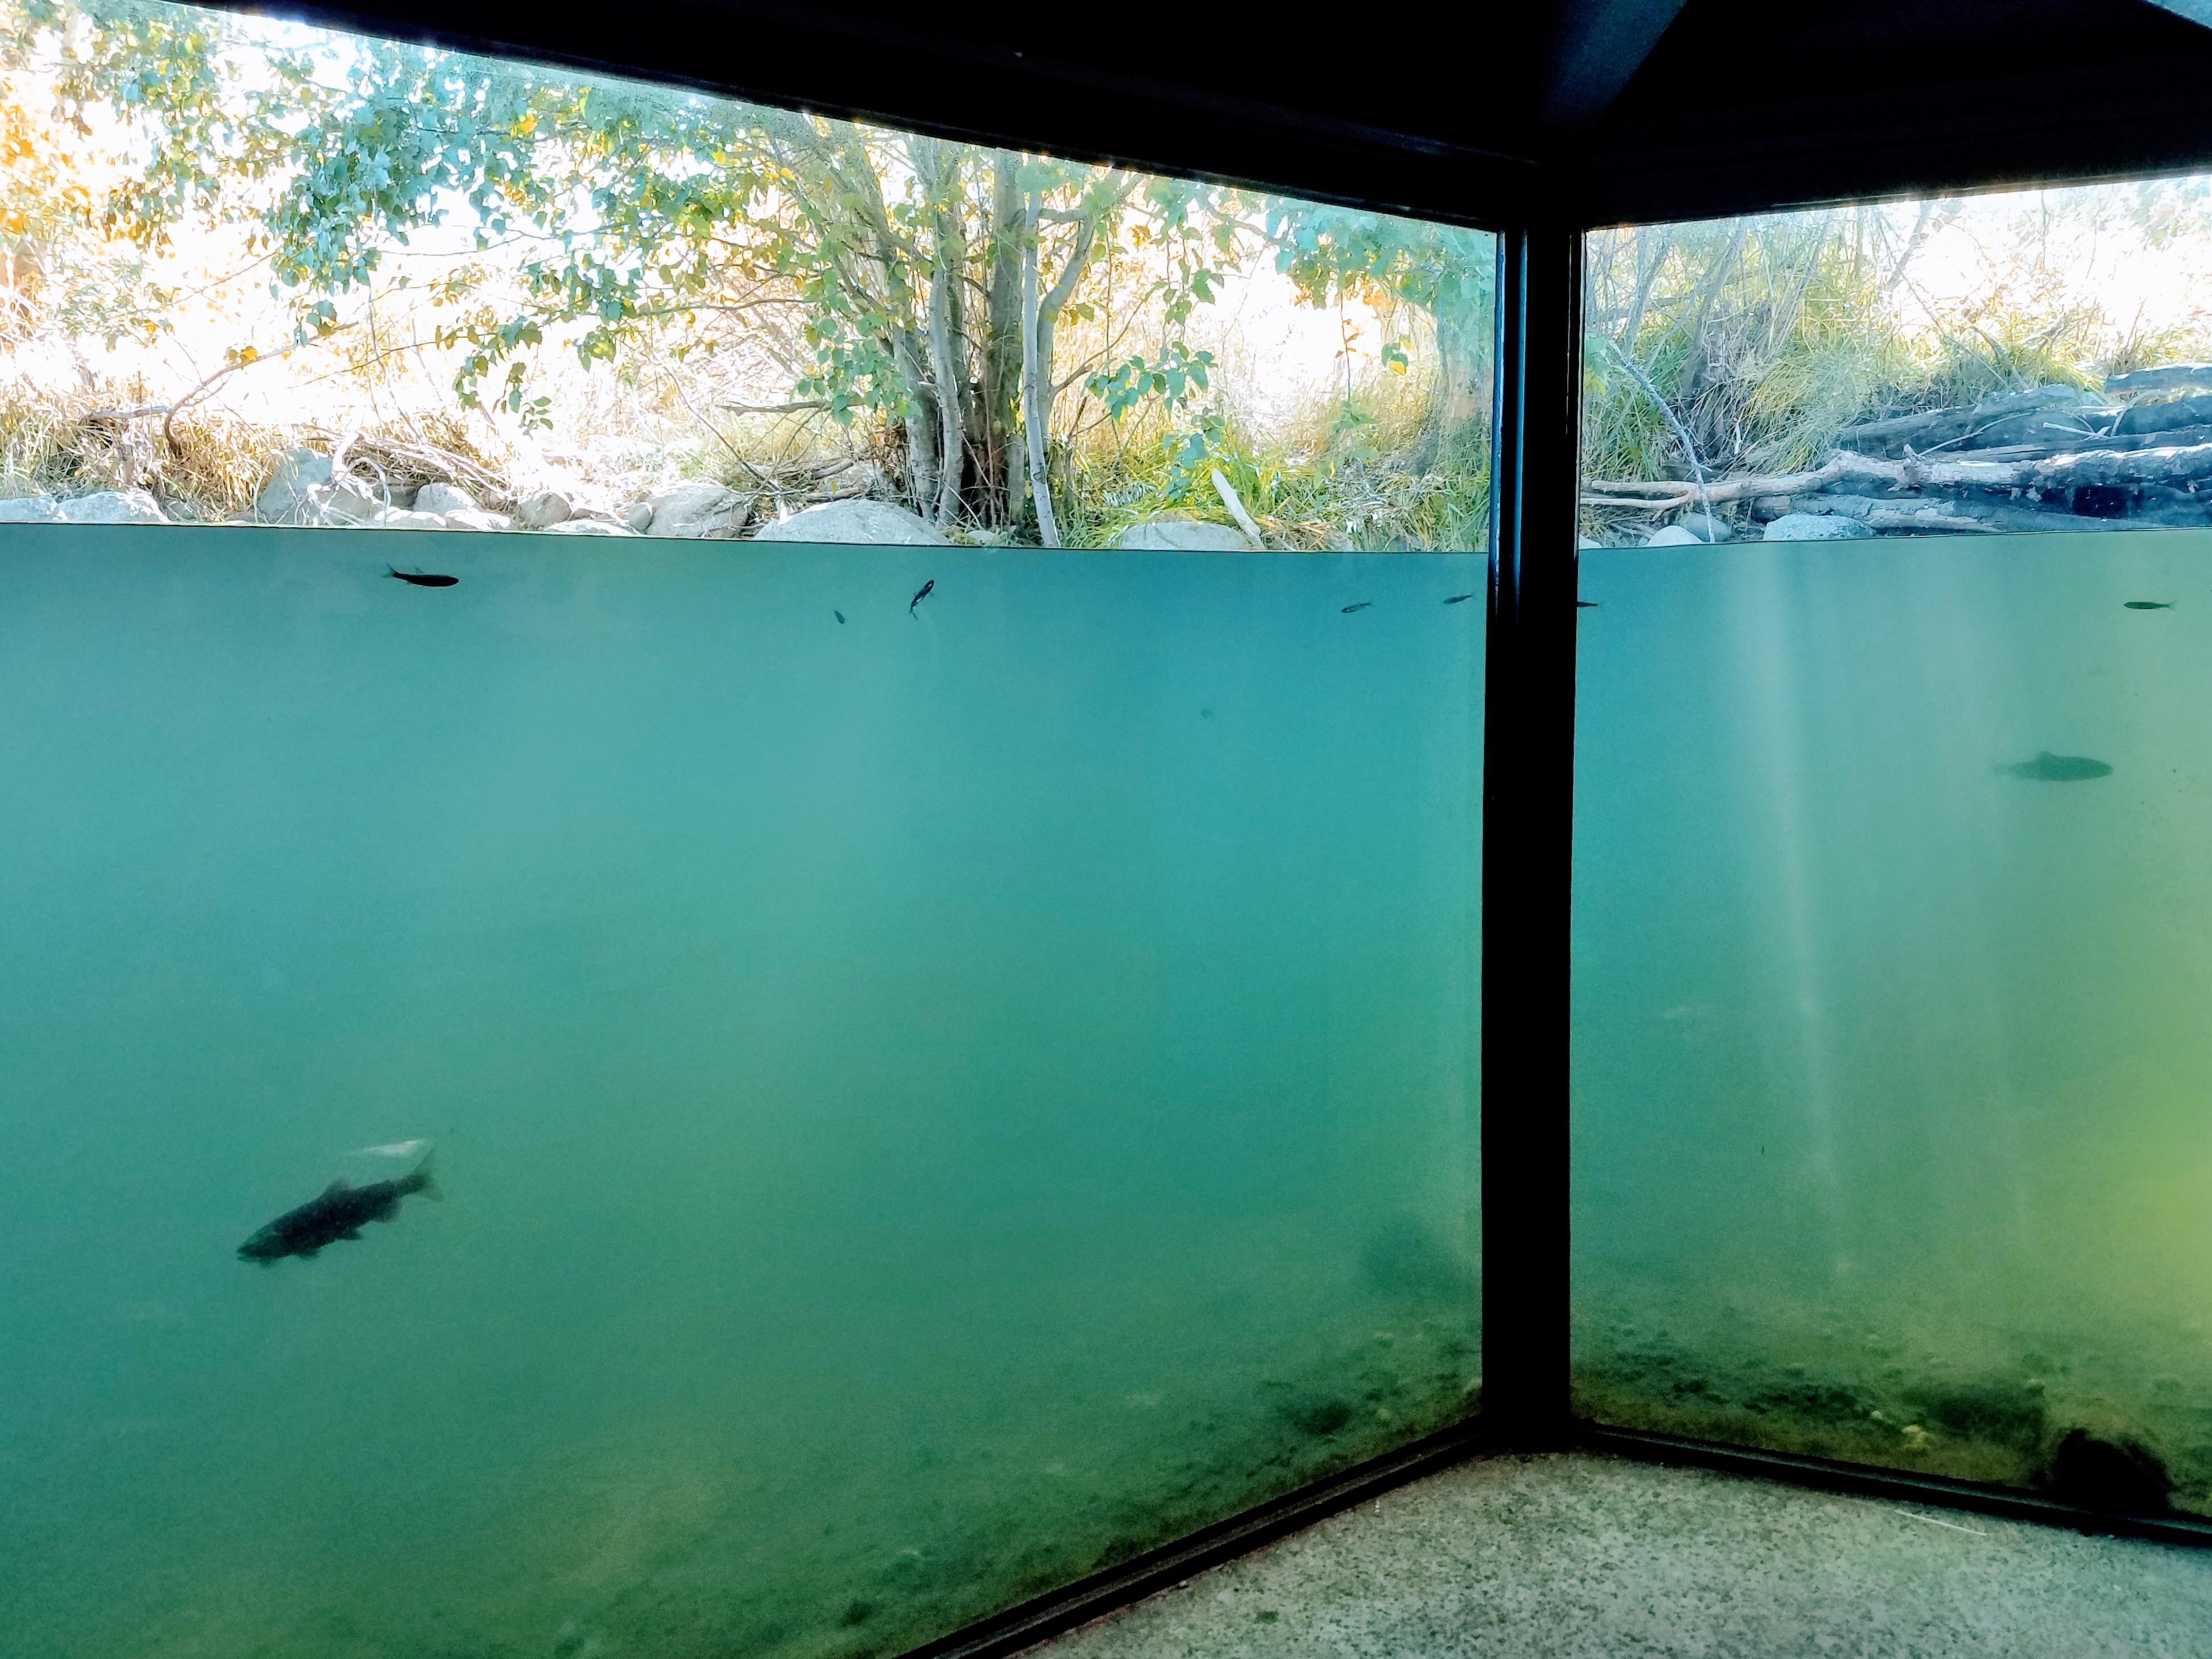 Taylor Creek Chamber